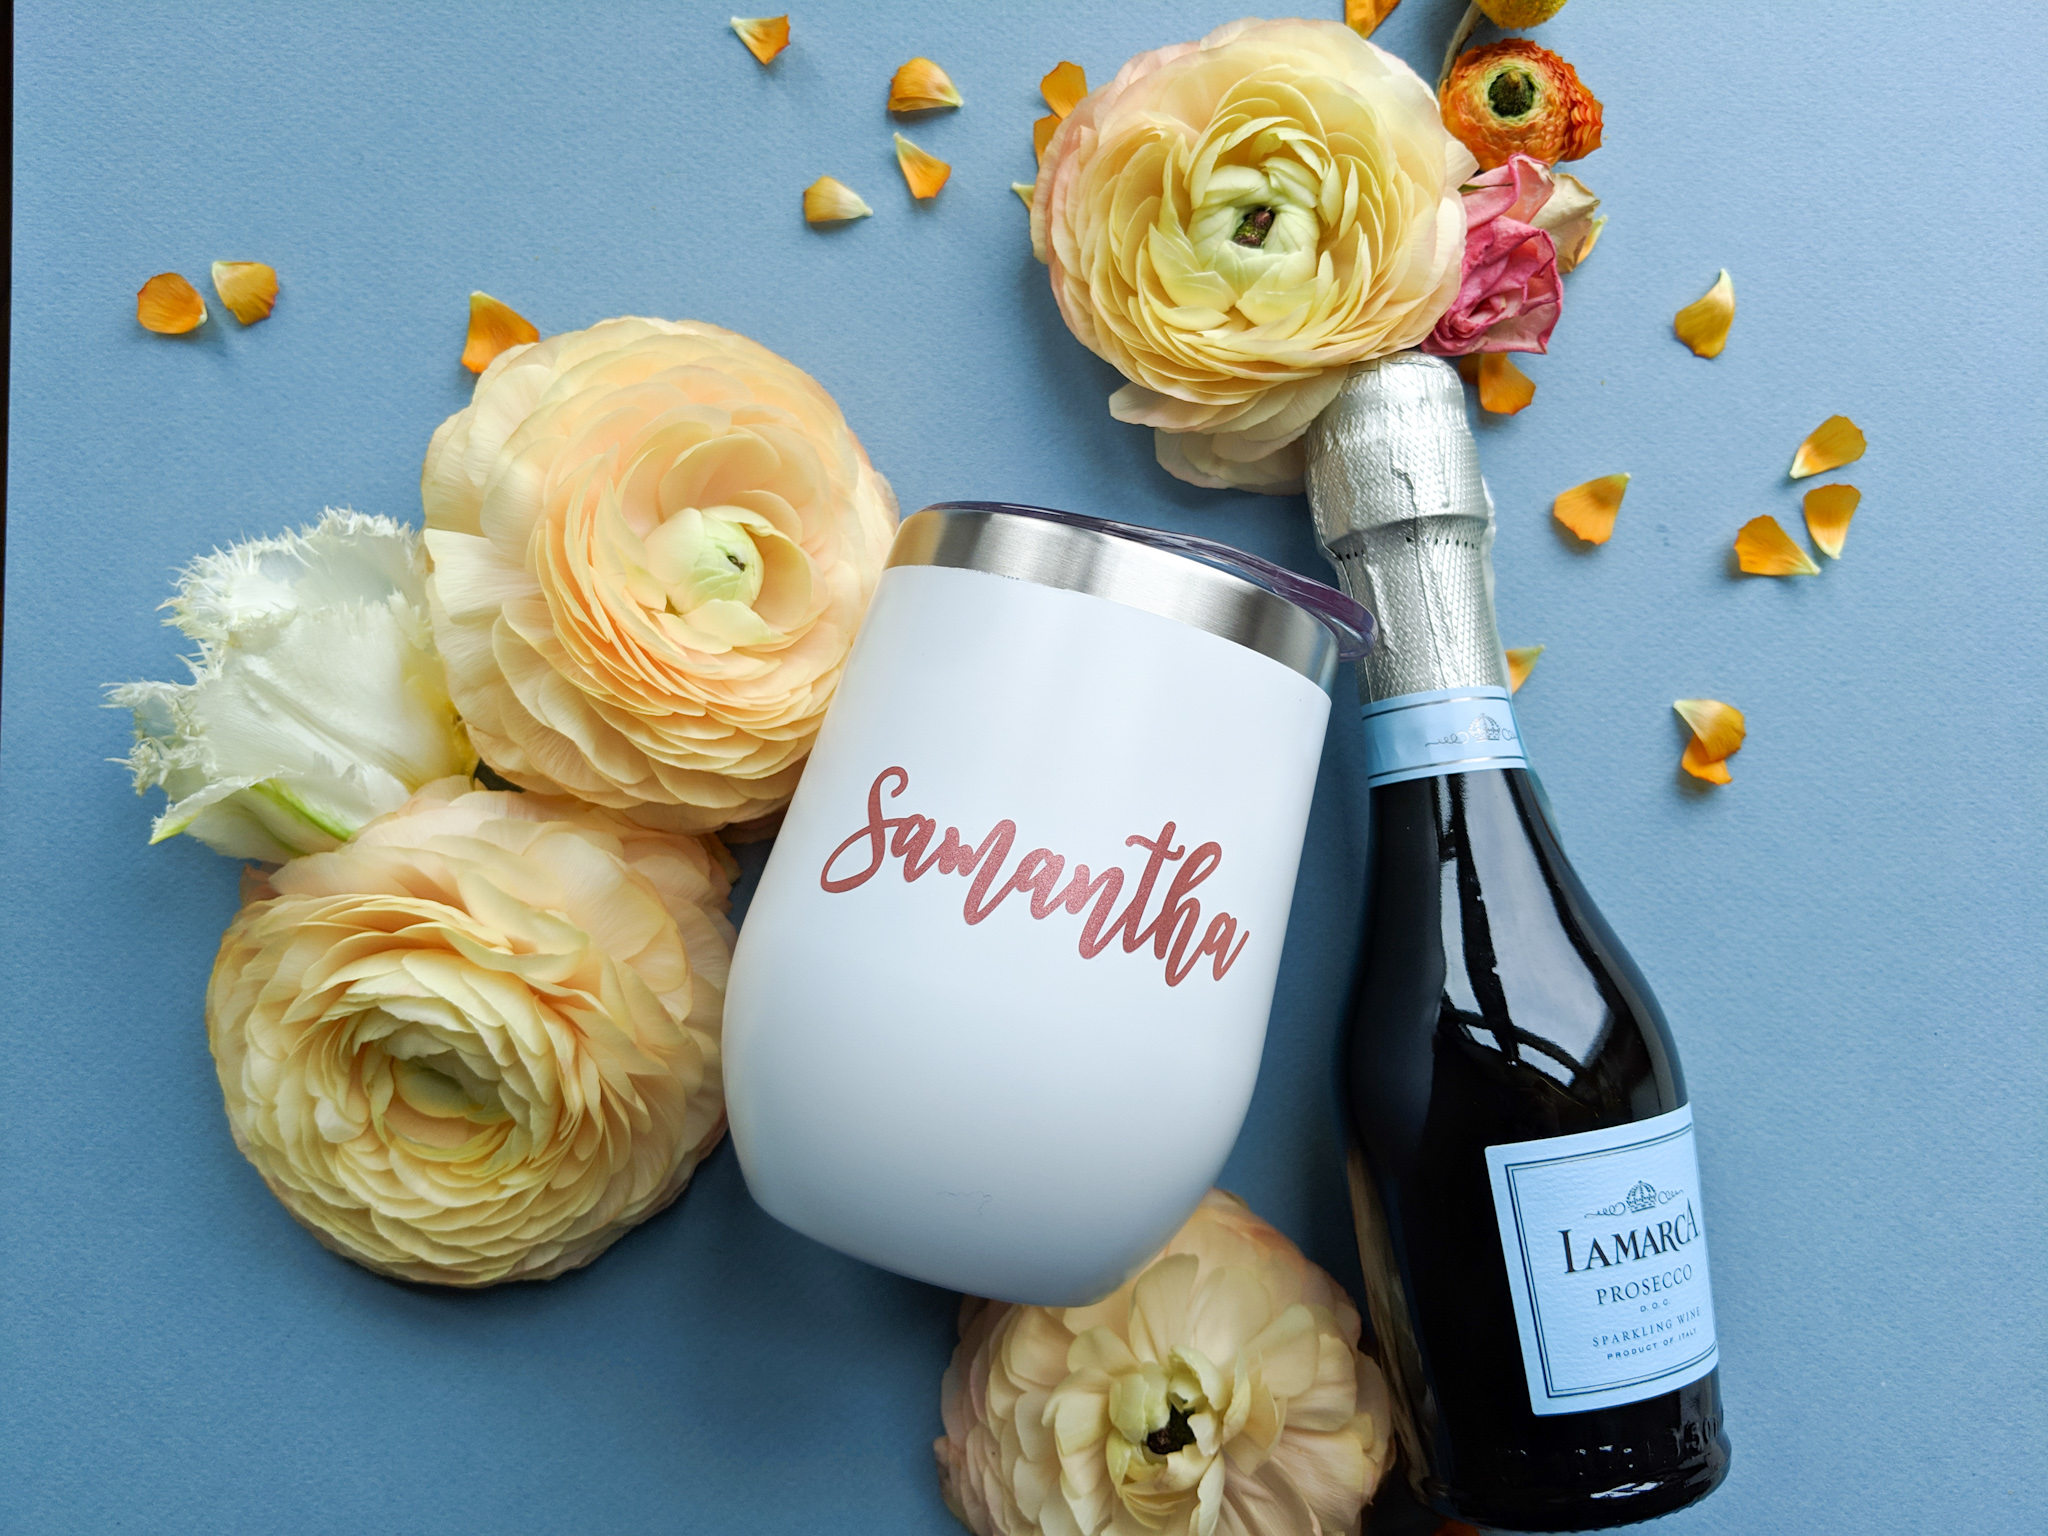 bridesmaids gift wine glass and wine